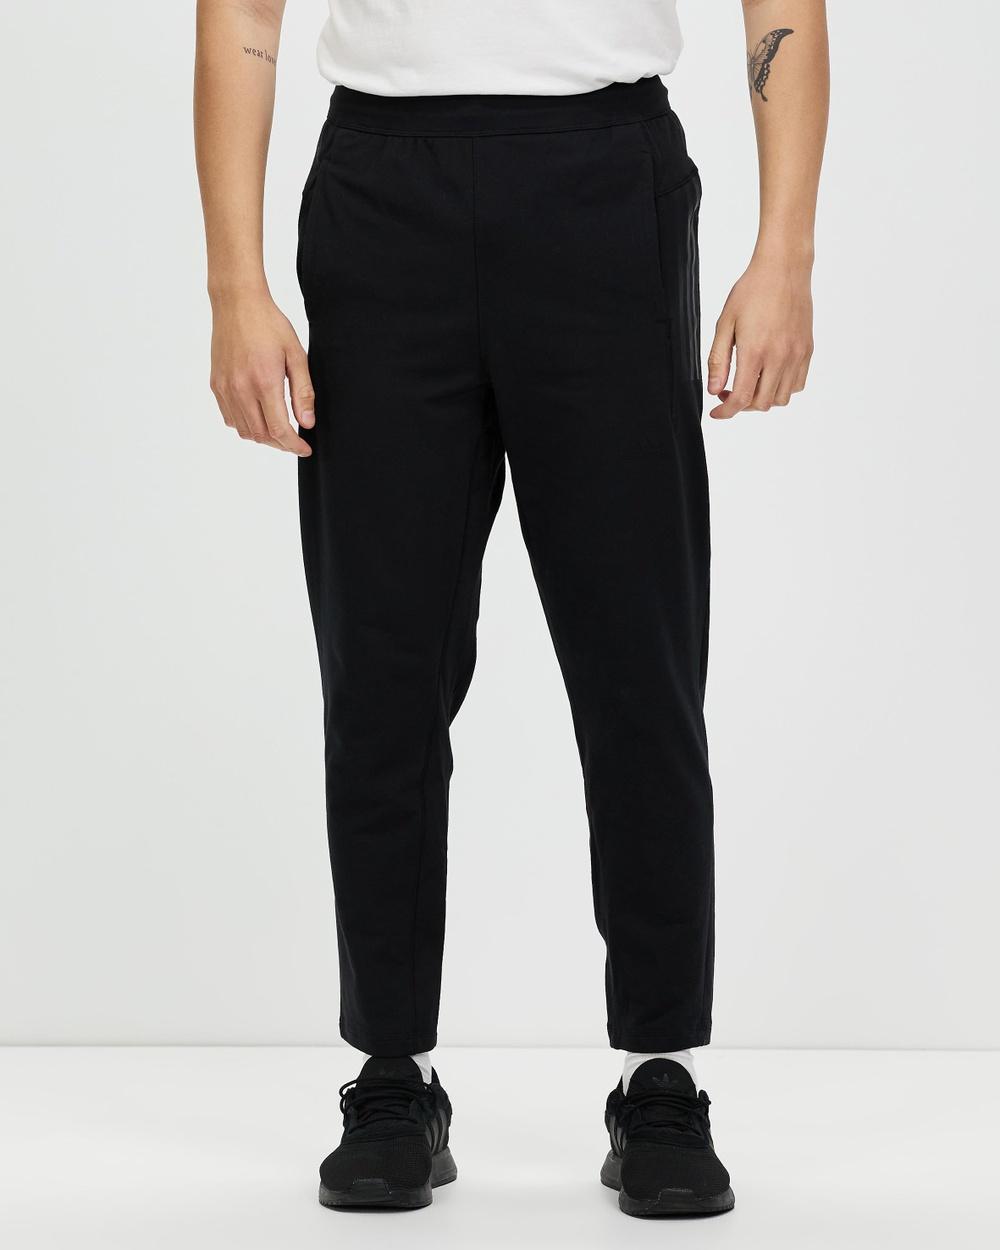 adidas Performance Yoga Pants Sweatpants Black